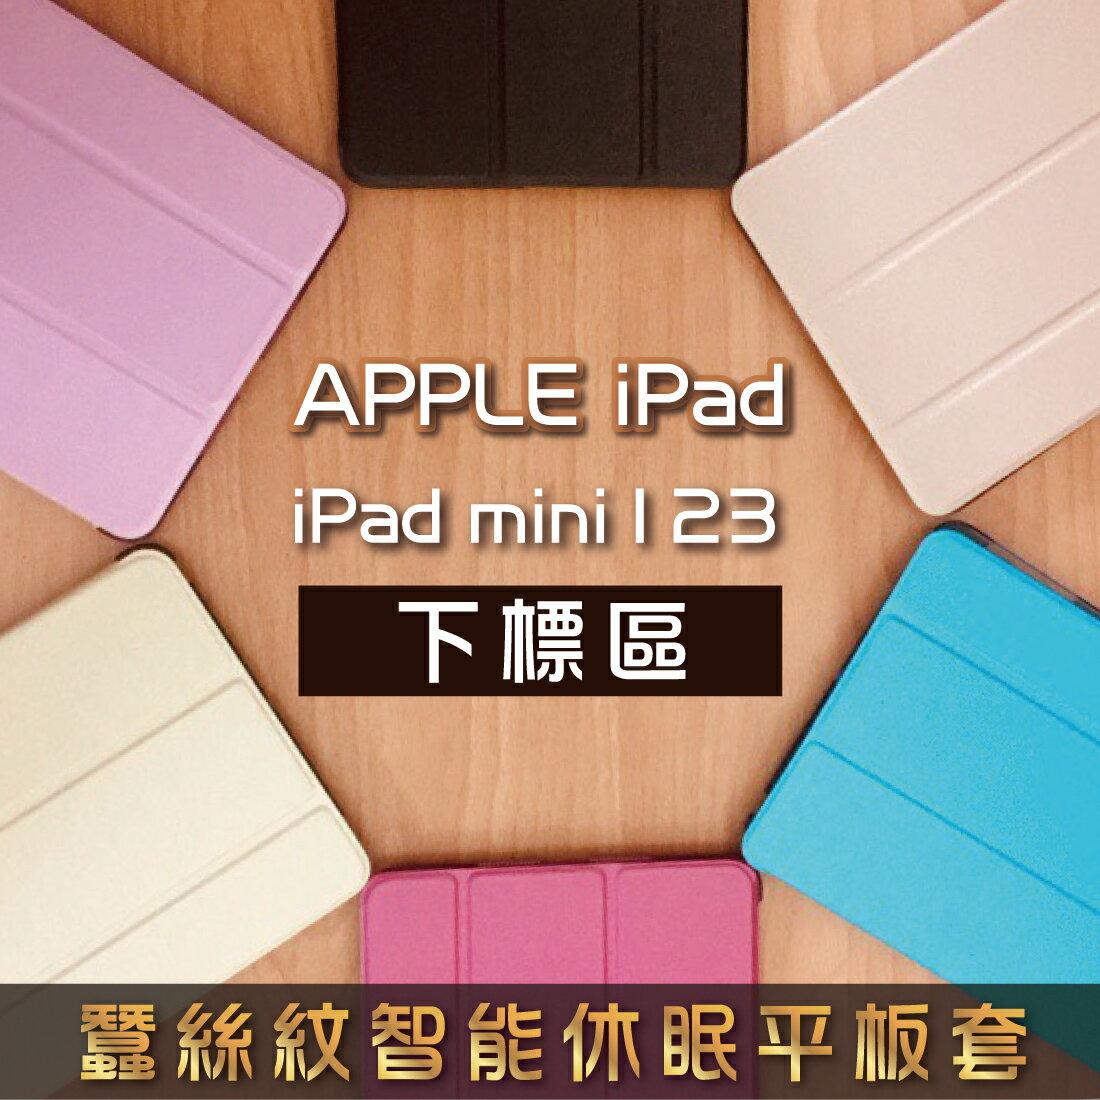 iPad Mini 1/2/3 蠶絲紋智能休眠平板保護套 mini1 mini2 mini3 平板保護套 另售鋼化玻璃貼 滿299免運